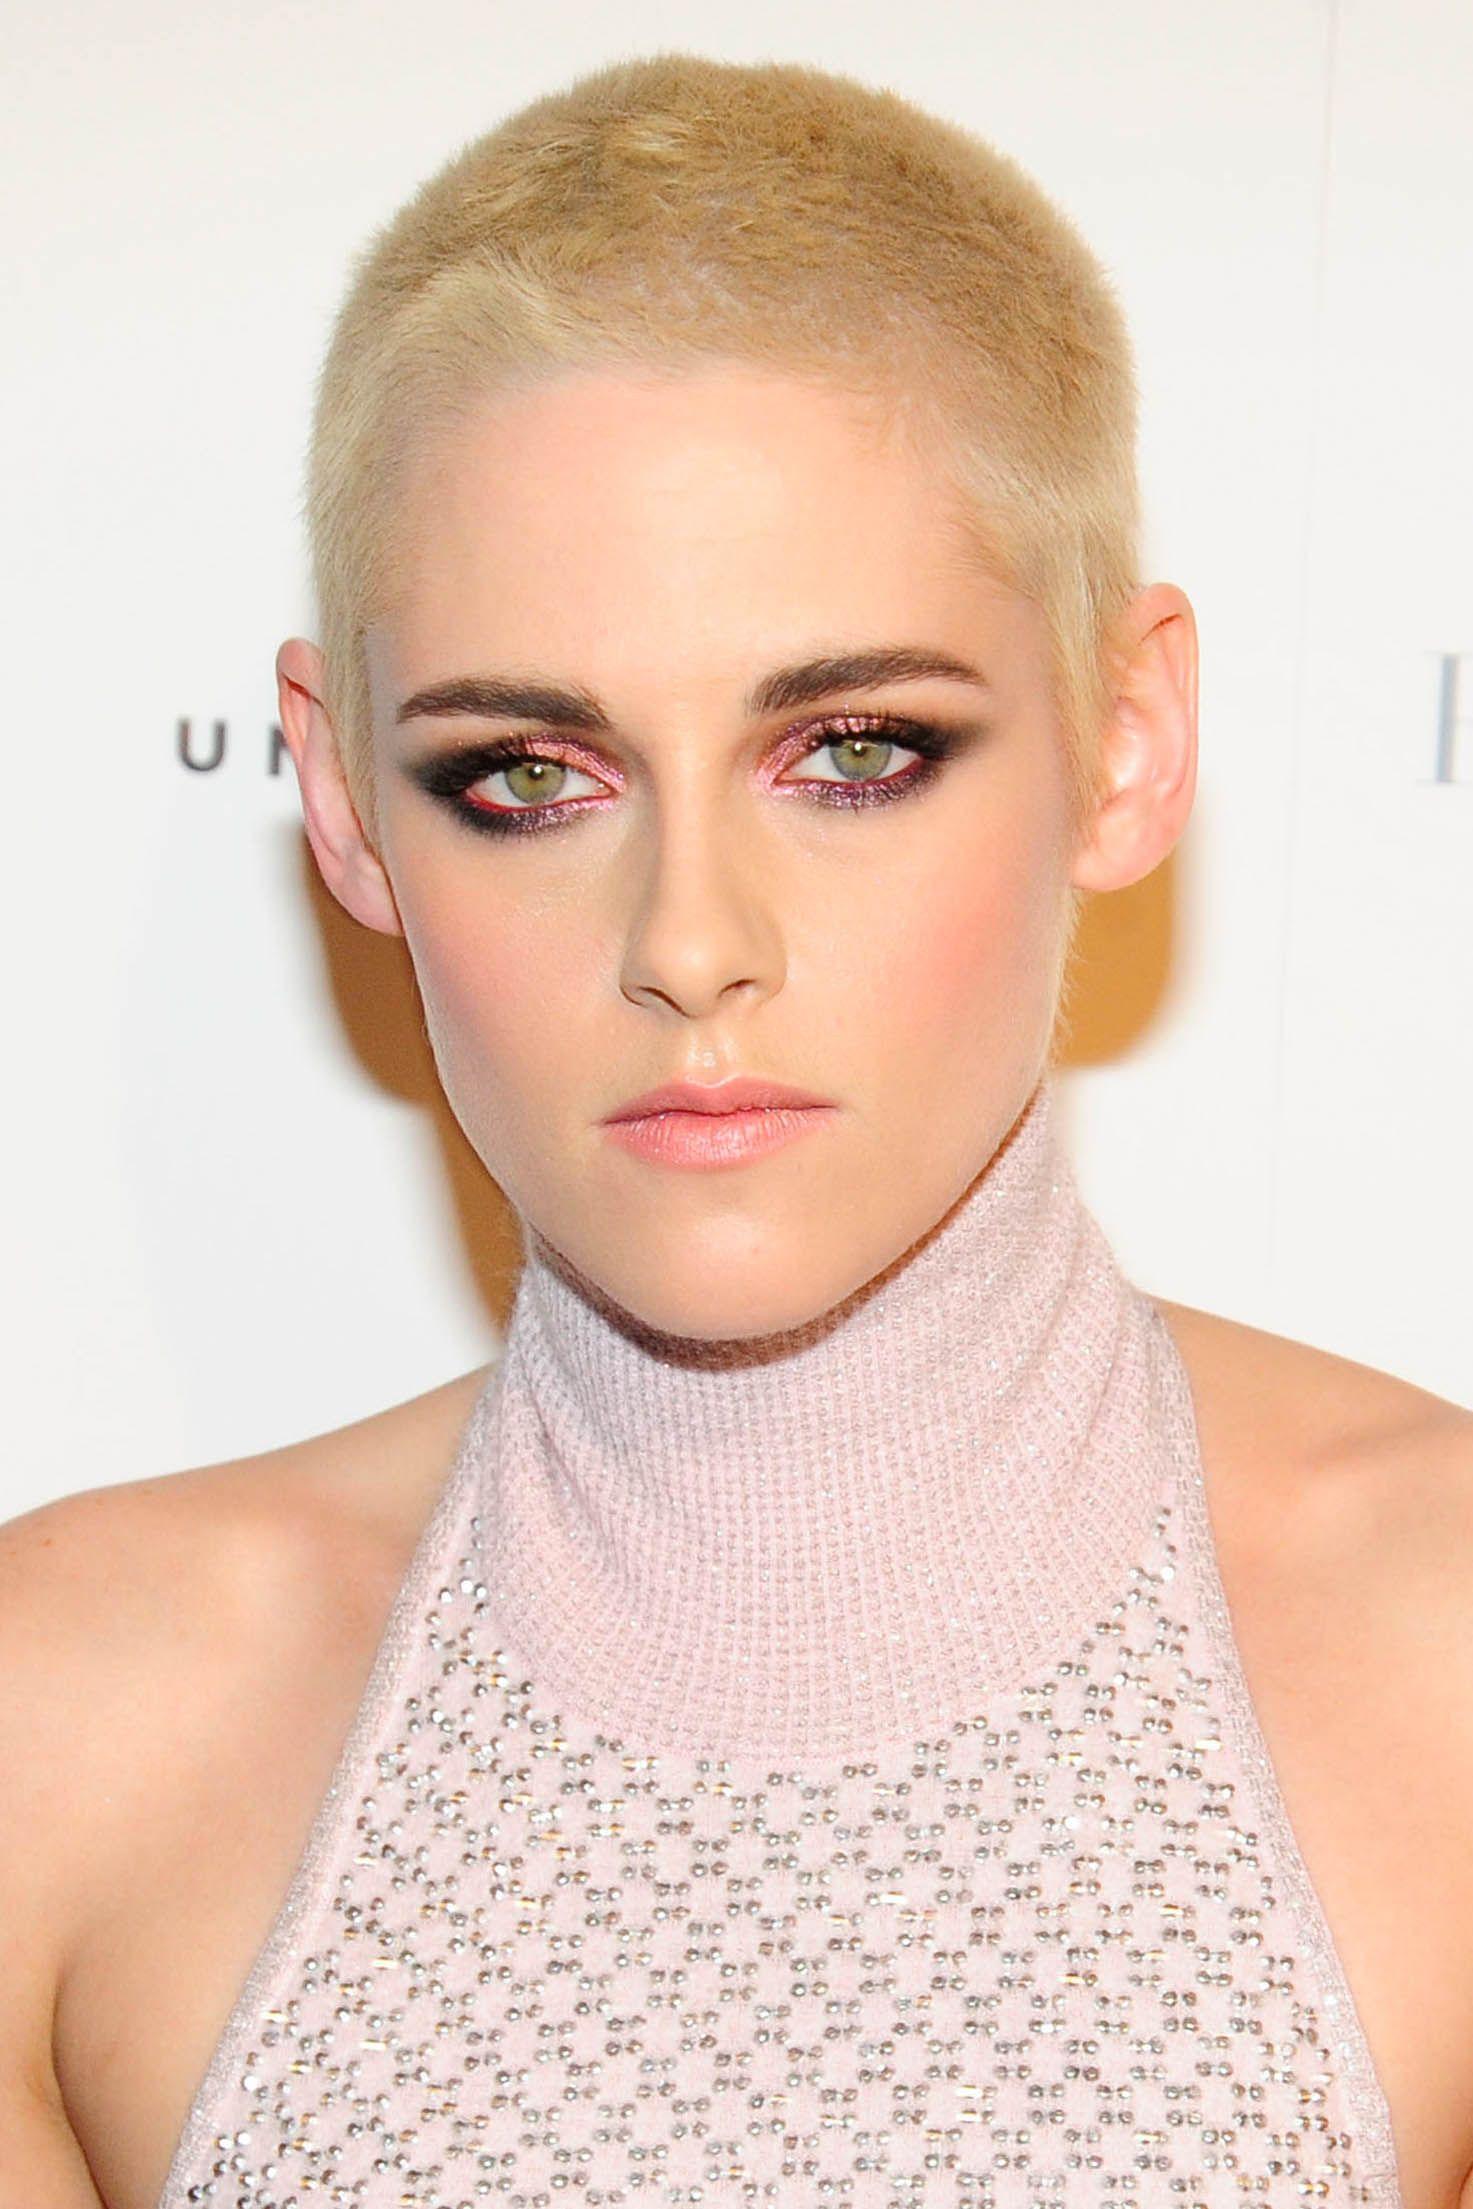 Women shaved head nude